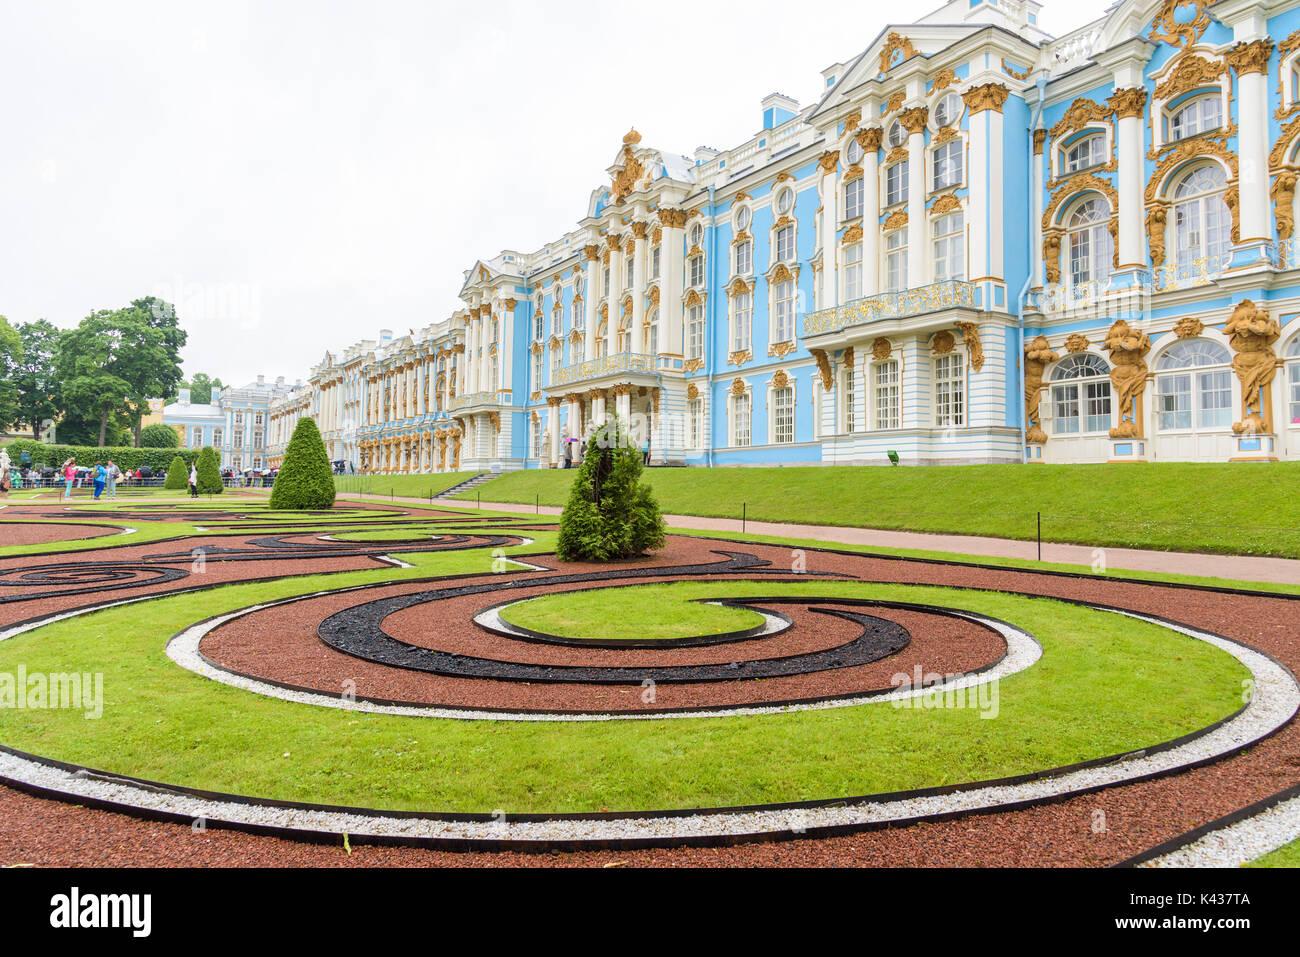 Catherine Palace, a Rococo palace in Tsarskoye Selo, Saint Petersburg, Russia - Stock Image